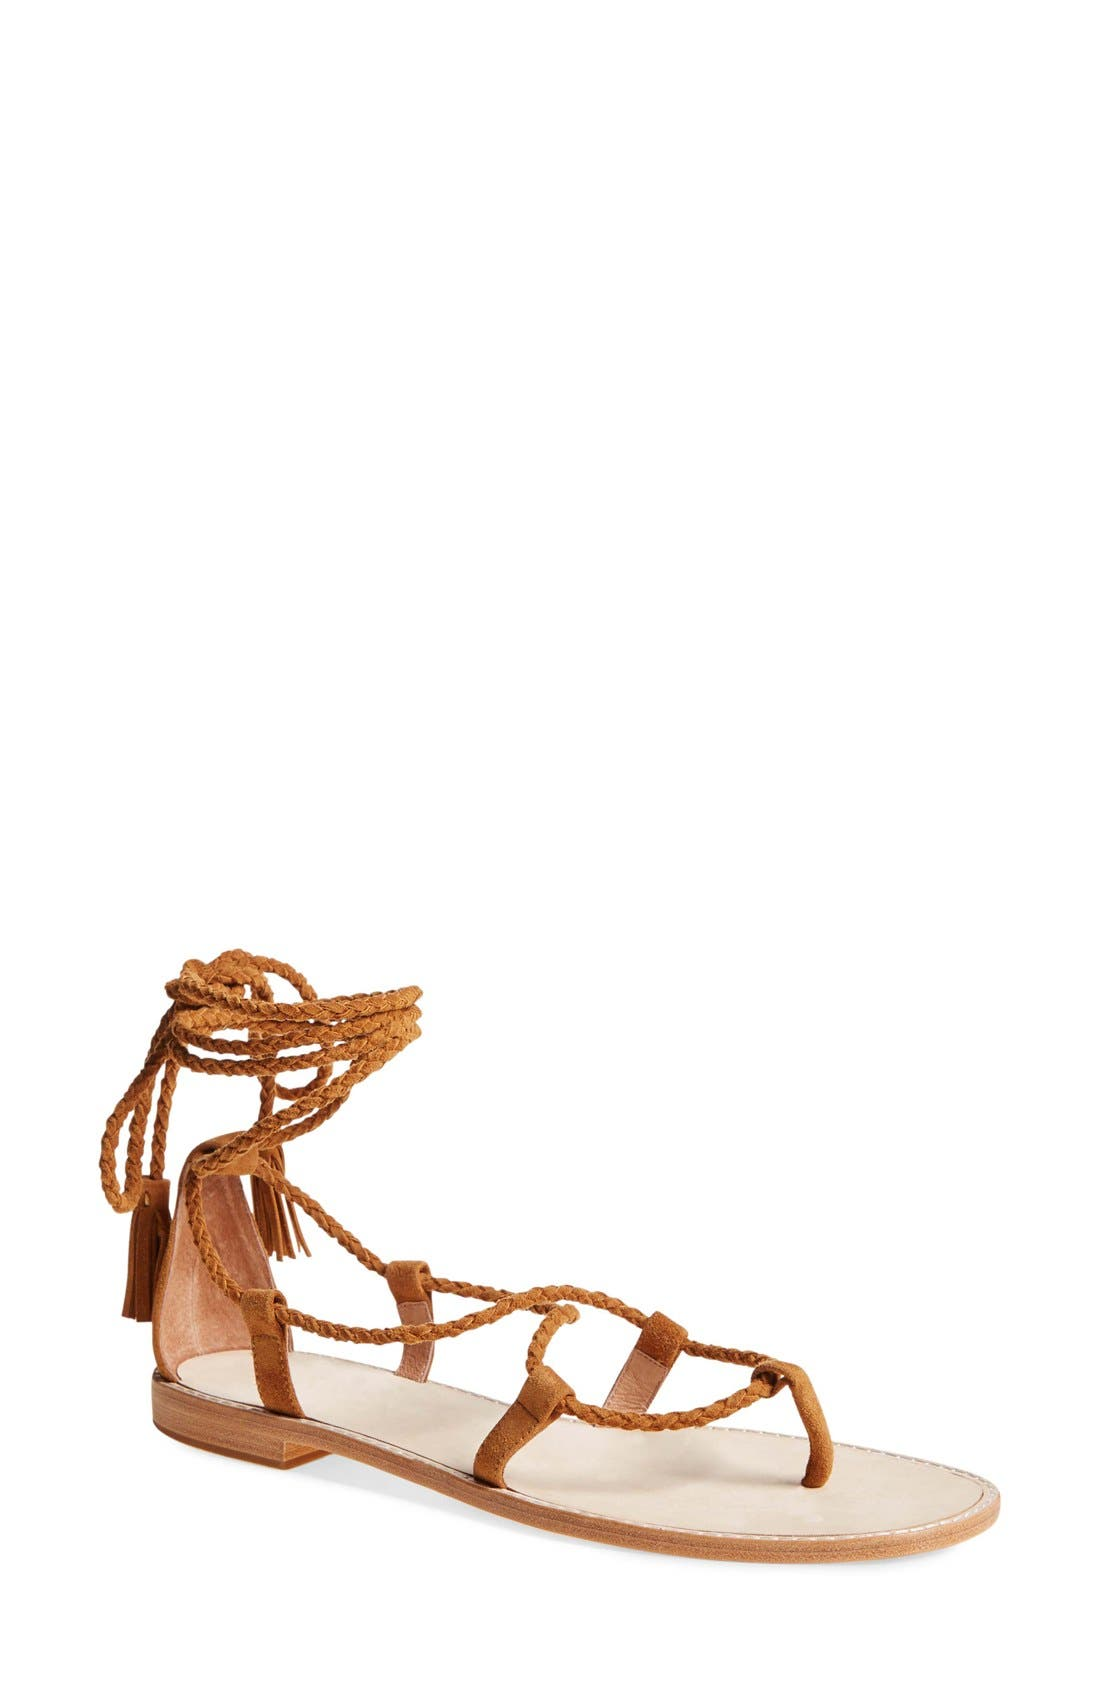 Main Image - Joie 'Bailee' Lace-Up Sandal (Women)